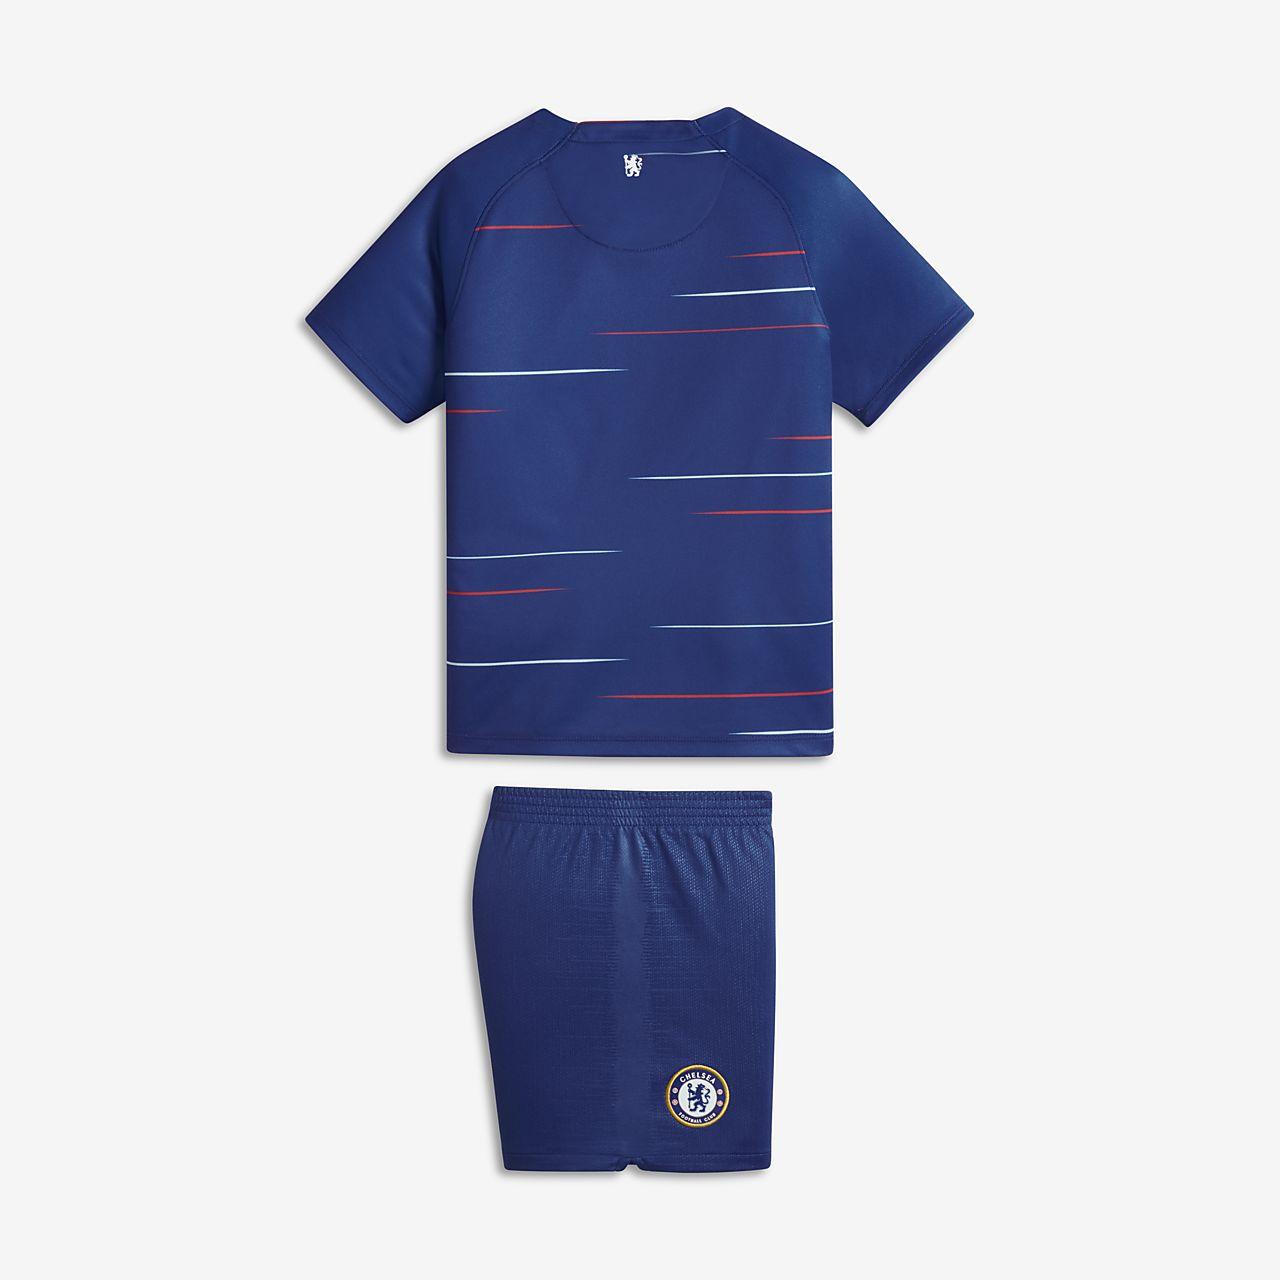 ... Kit da calcio 2018/19 Chelsea FC Stadium Home - Bambini